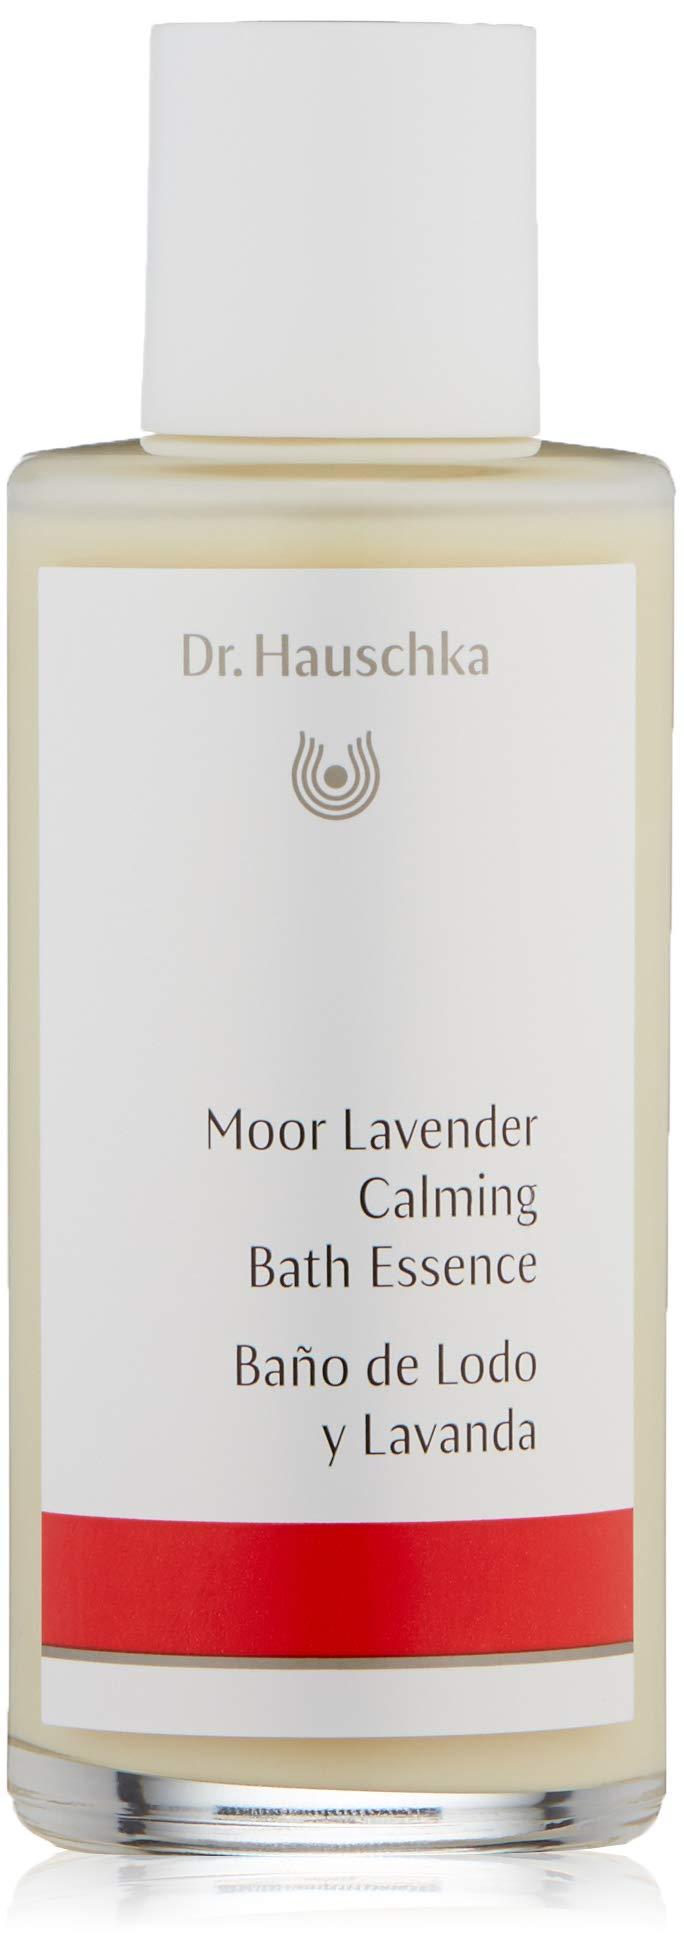 Dr. Hauschka Moor Lavender Calming Bath Essence, 3.4 Fl Oz